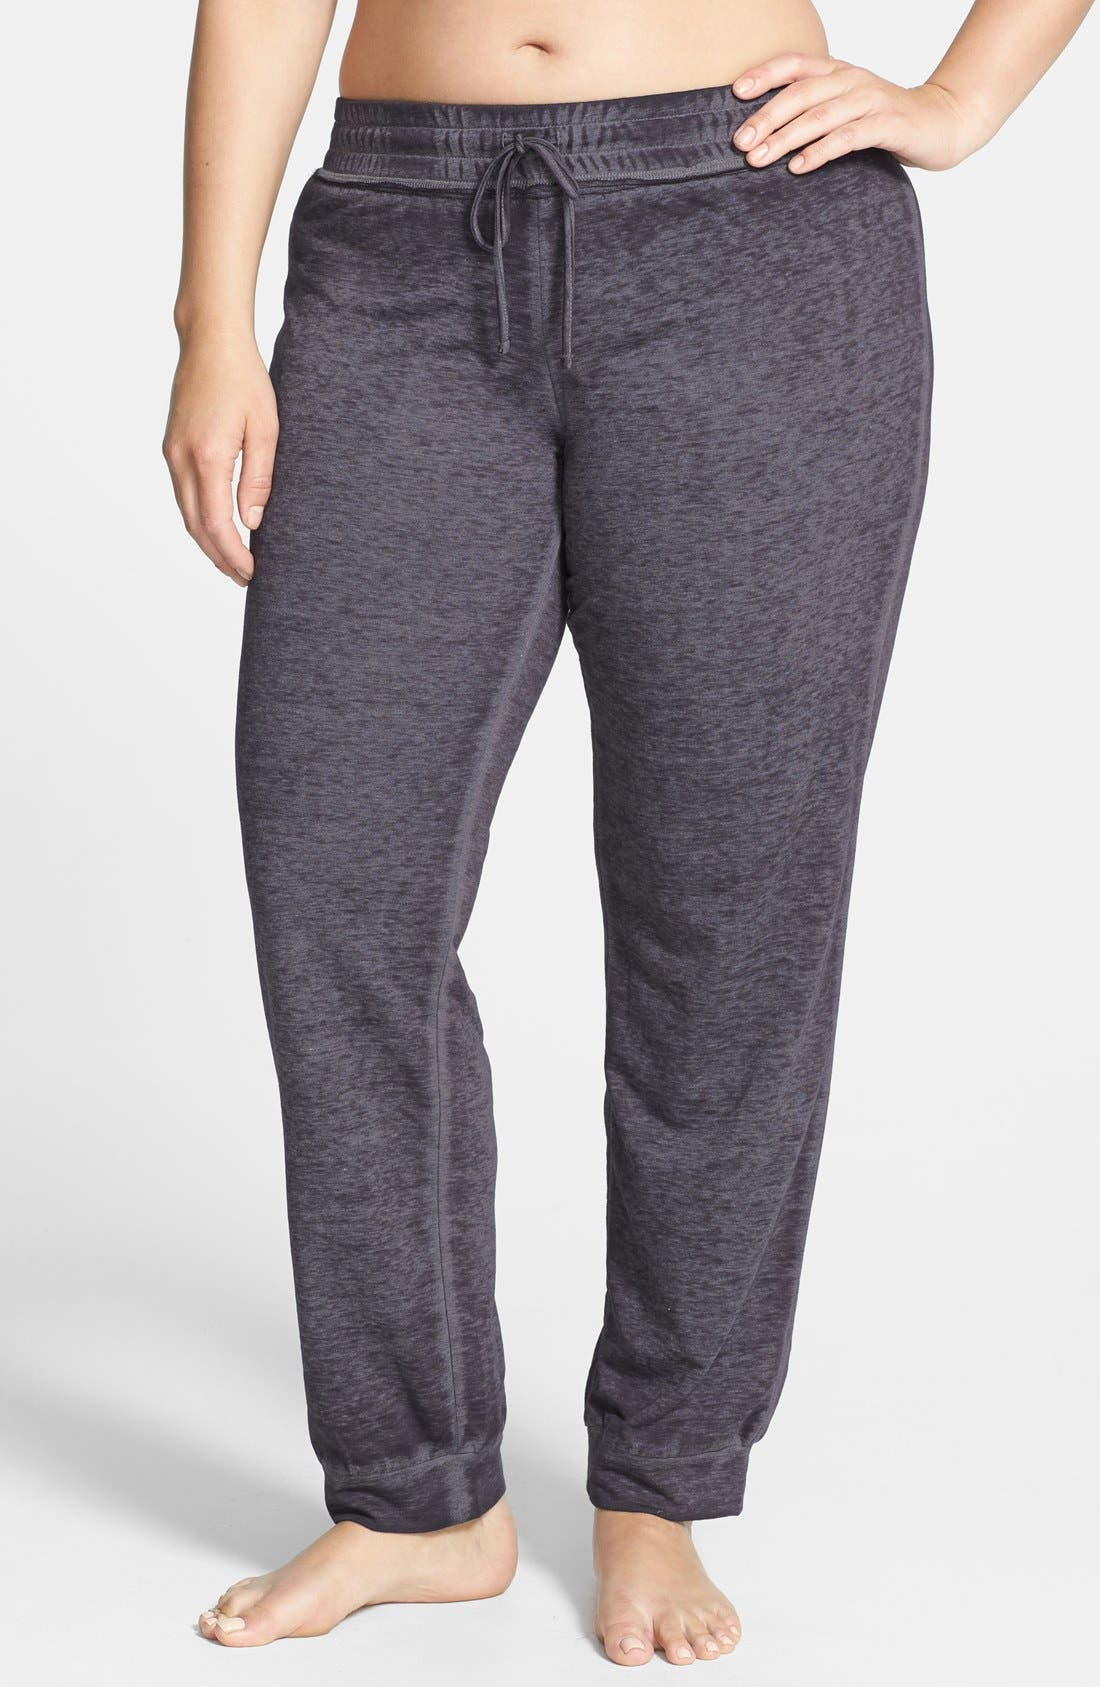 Alternate Image 1 Selected - Make + Model 'Paige' Skinny Sweatpants (Plus Size)